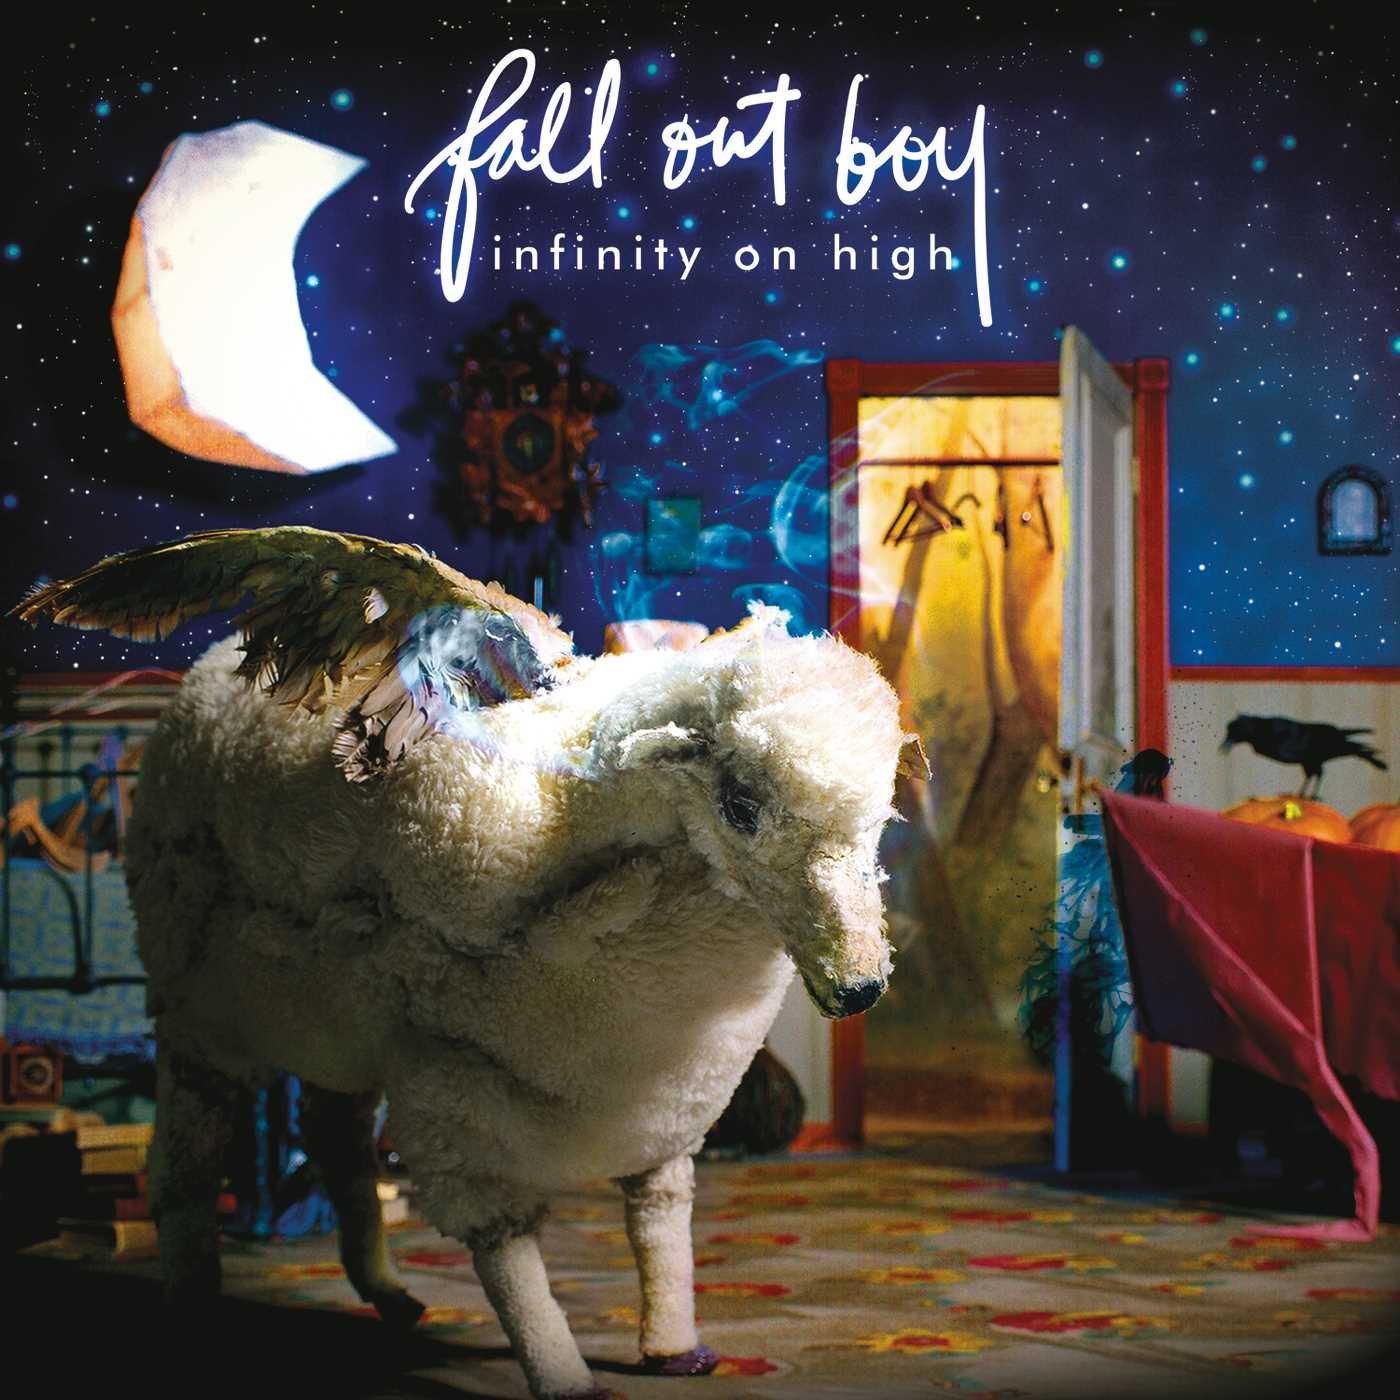 Fall Out Boy Boy. Infinity On High